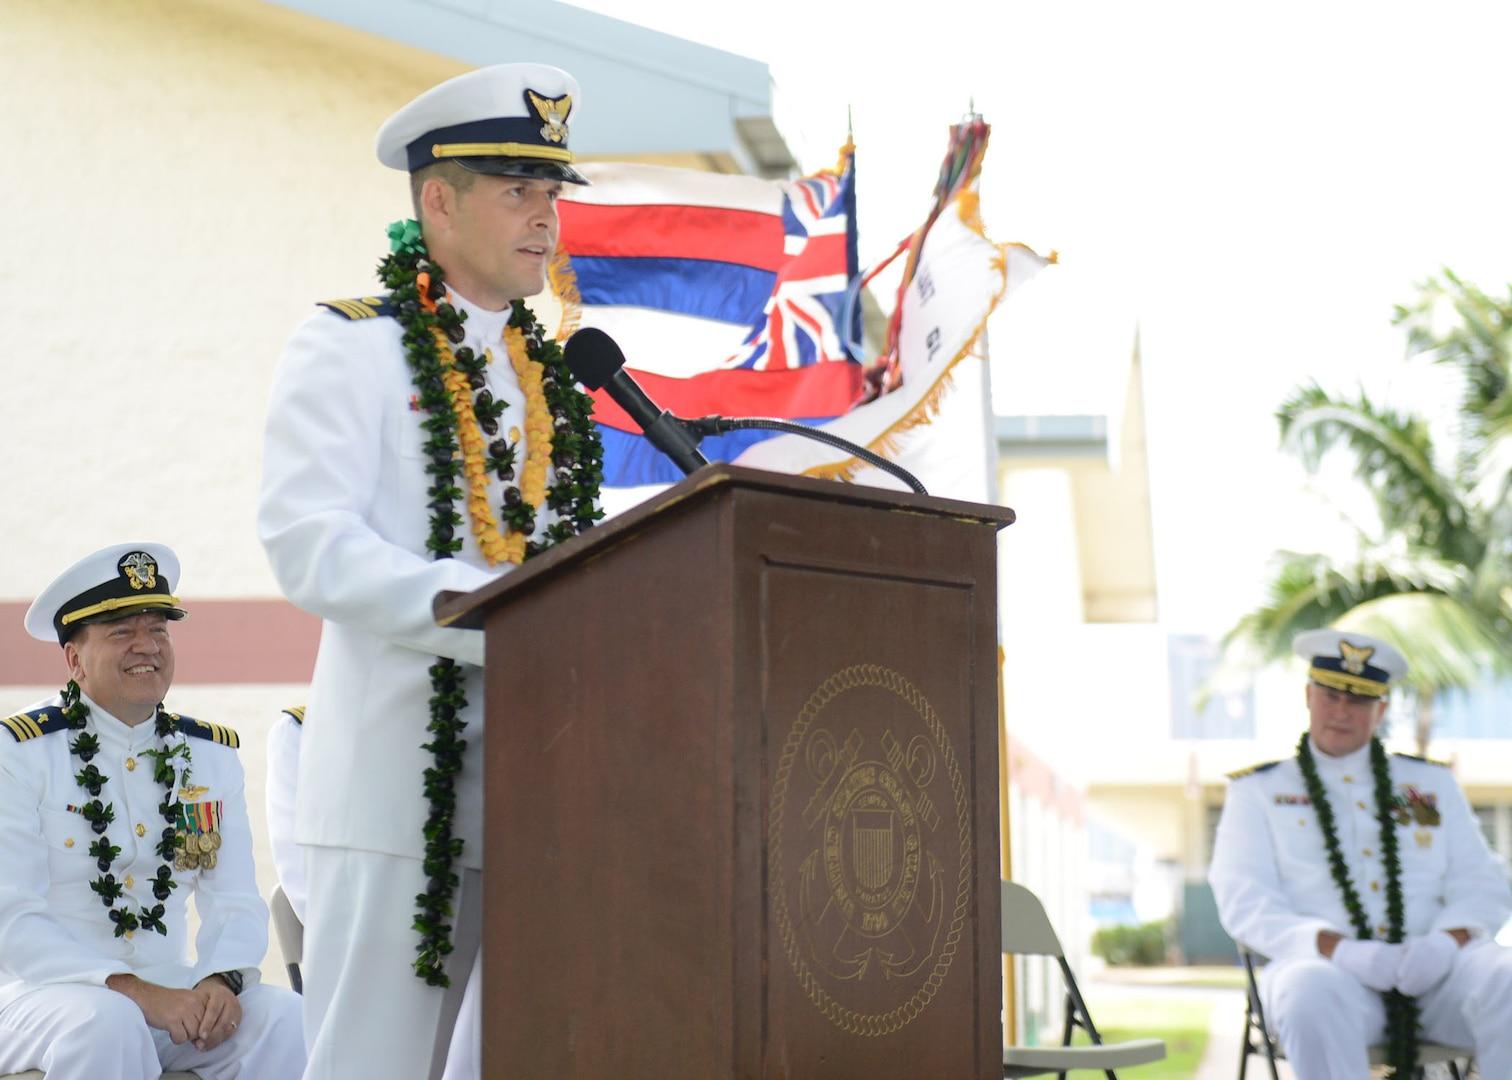 Coast Guard Civil Engineering Unit Honolulu Welcomes New Commanding Officer